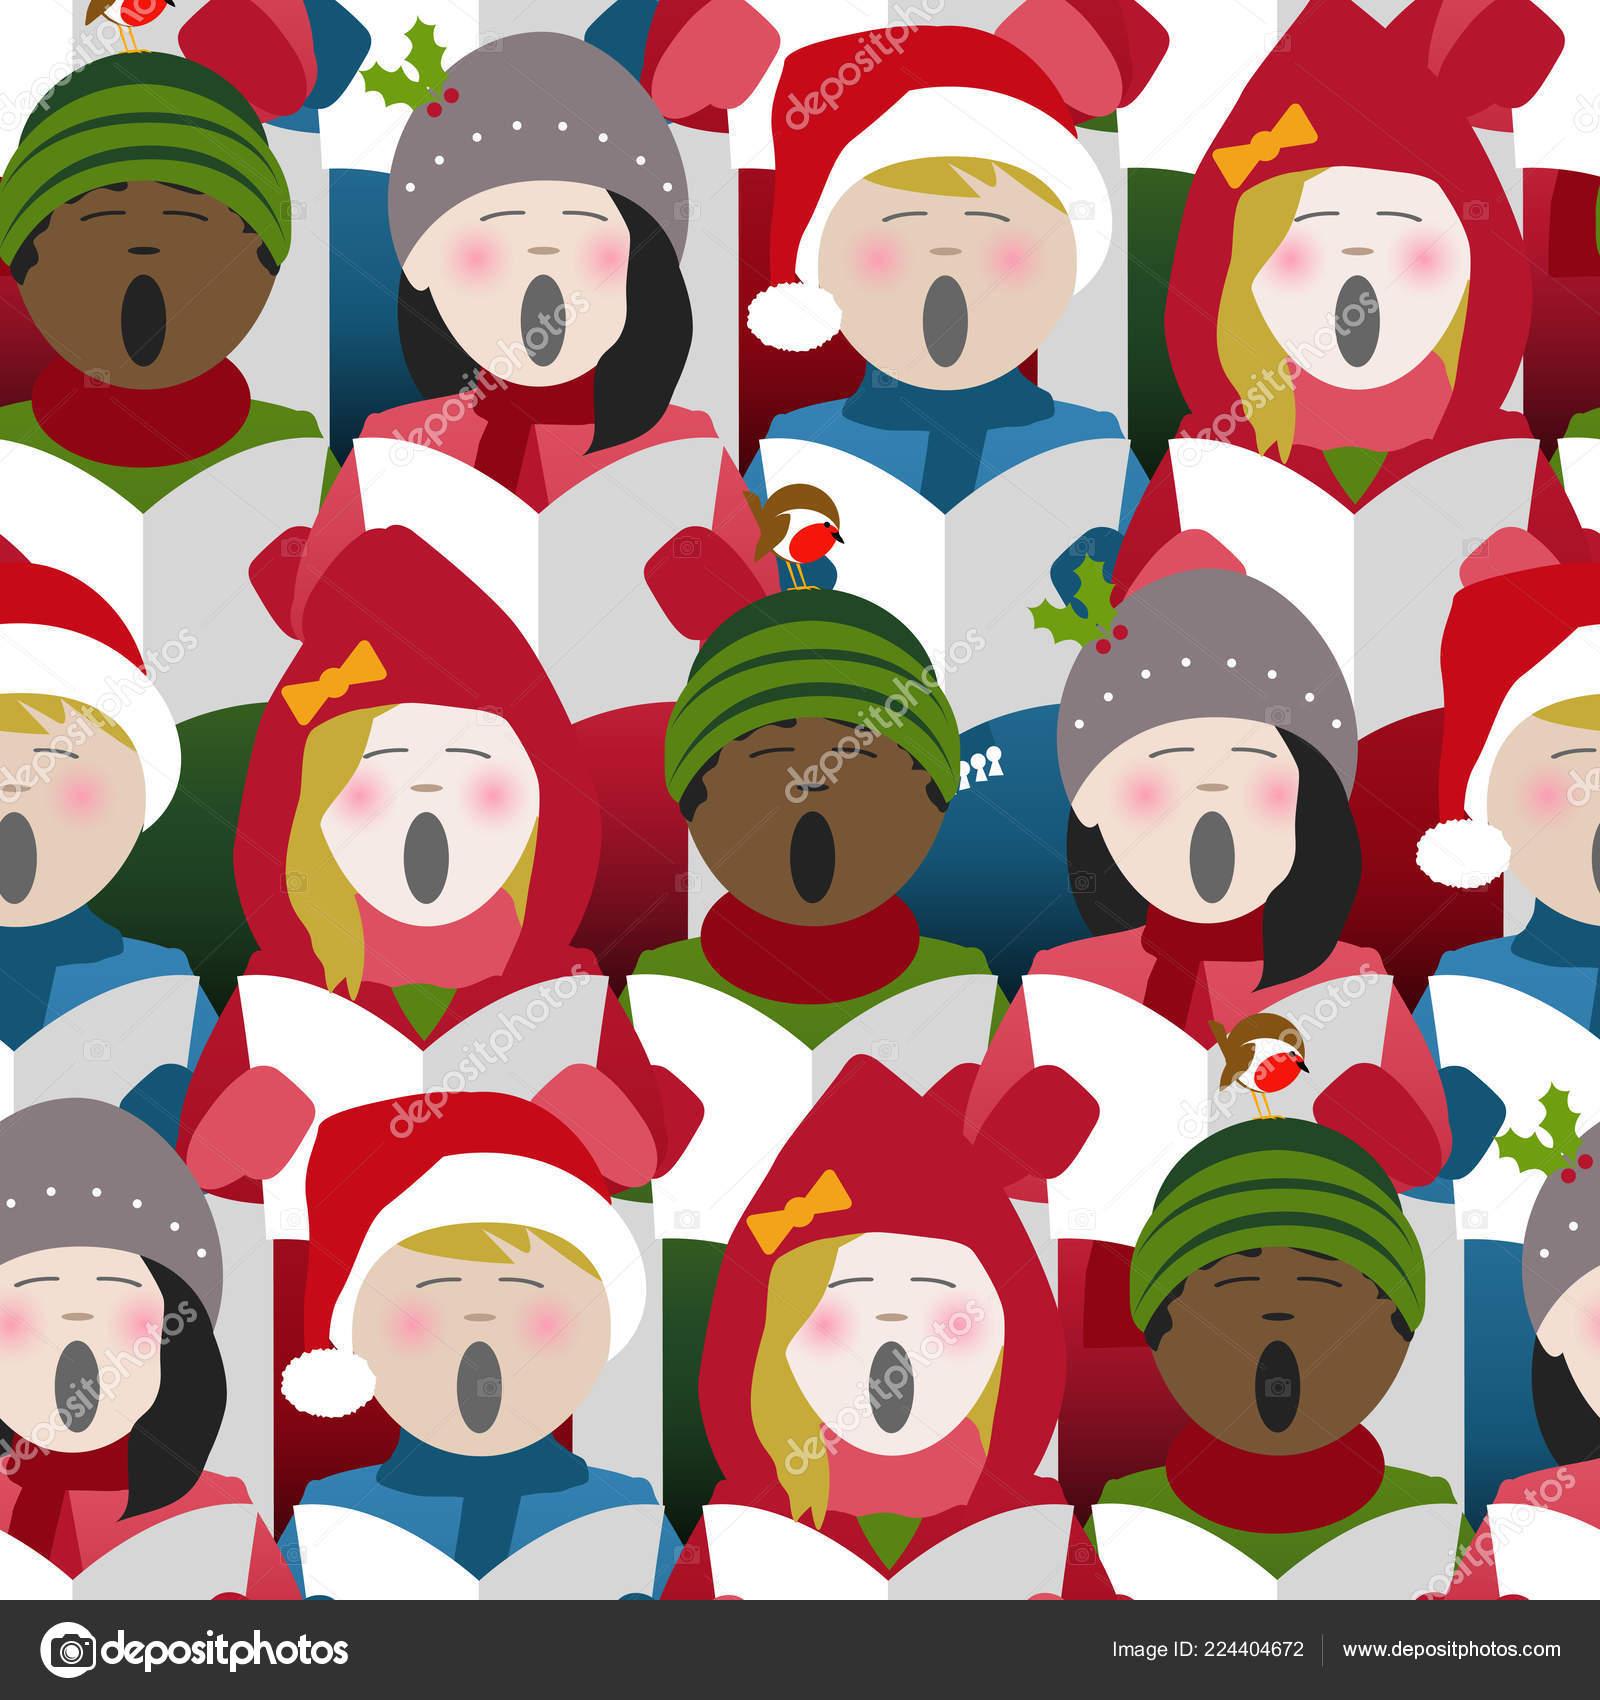 Christmas Singing Images.Children Wearing Winter Clothes Singing Christmas Carols